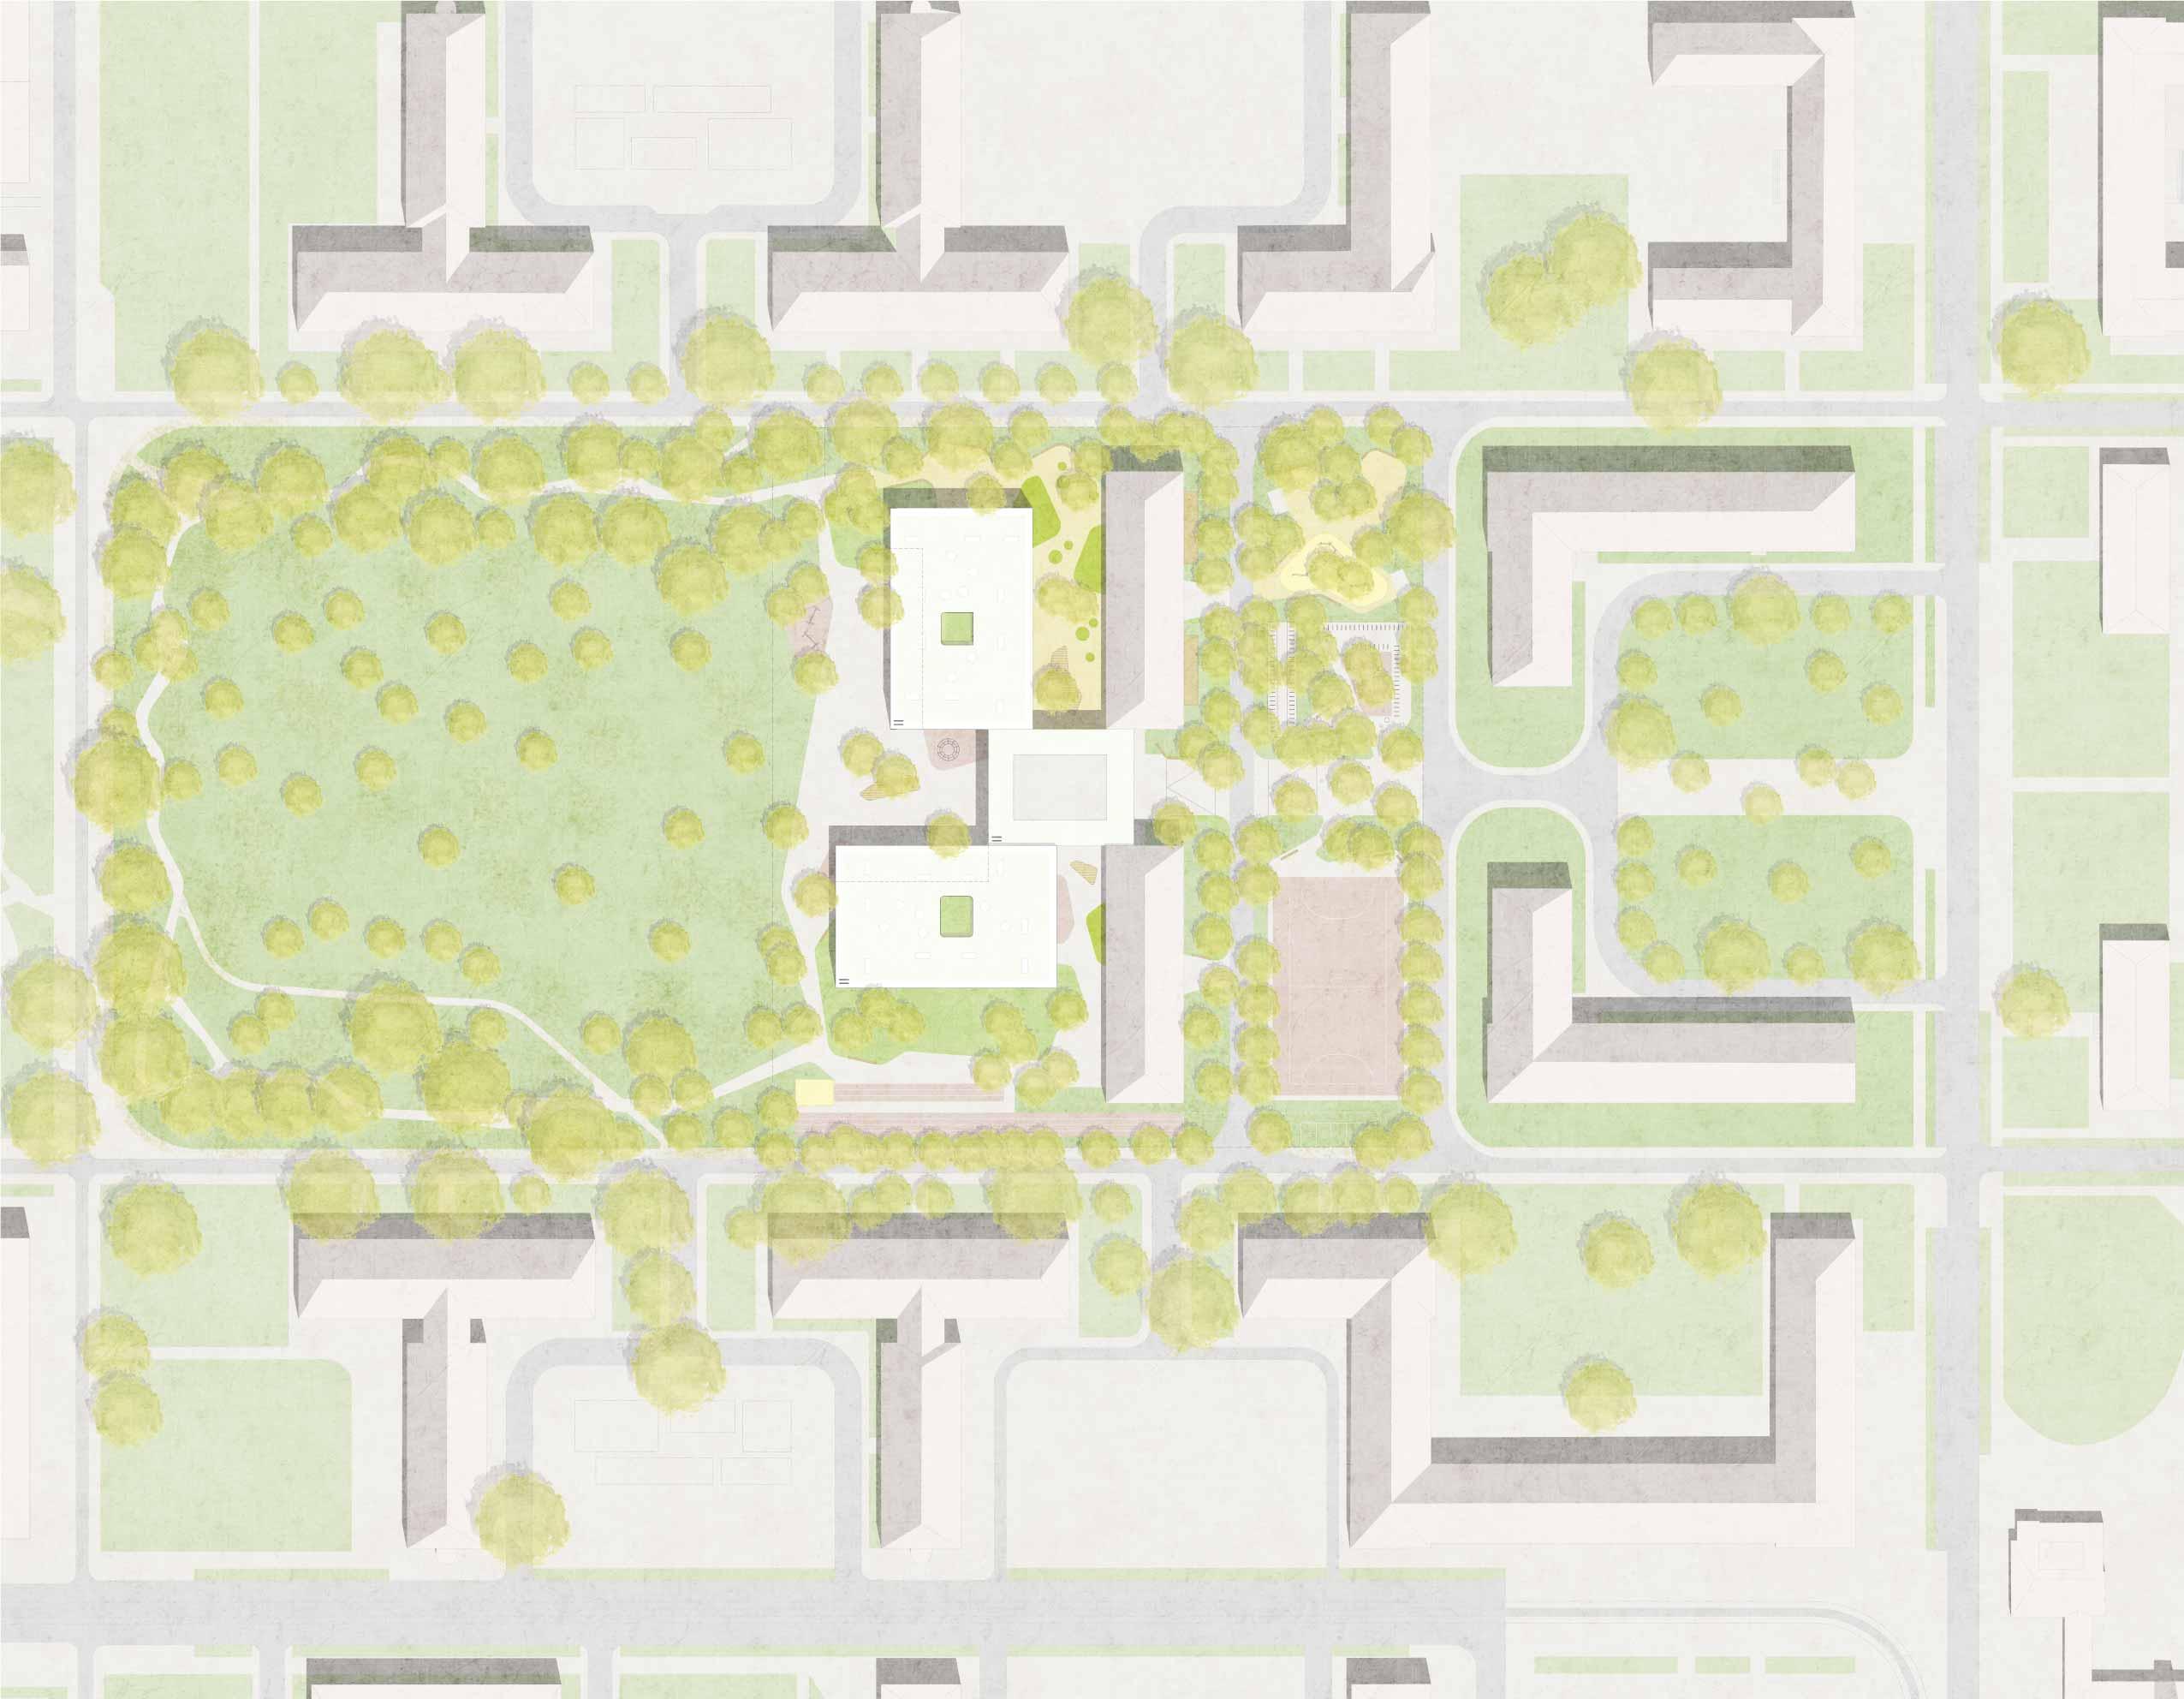 STUDIOKUBIK-architektur-architecture-berlin-Grundschule-Kindergarten-Hort-Krampnitz_LP